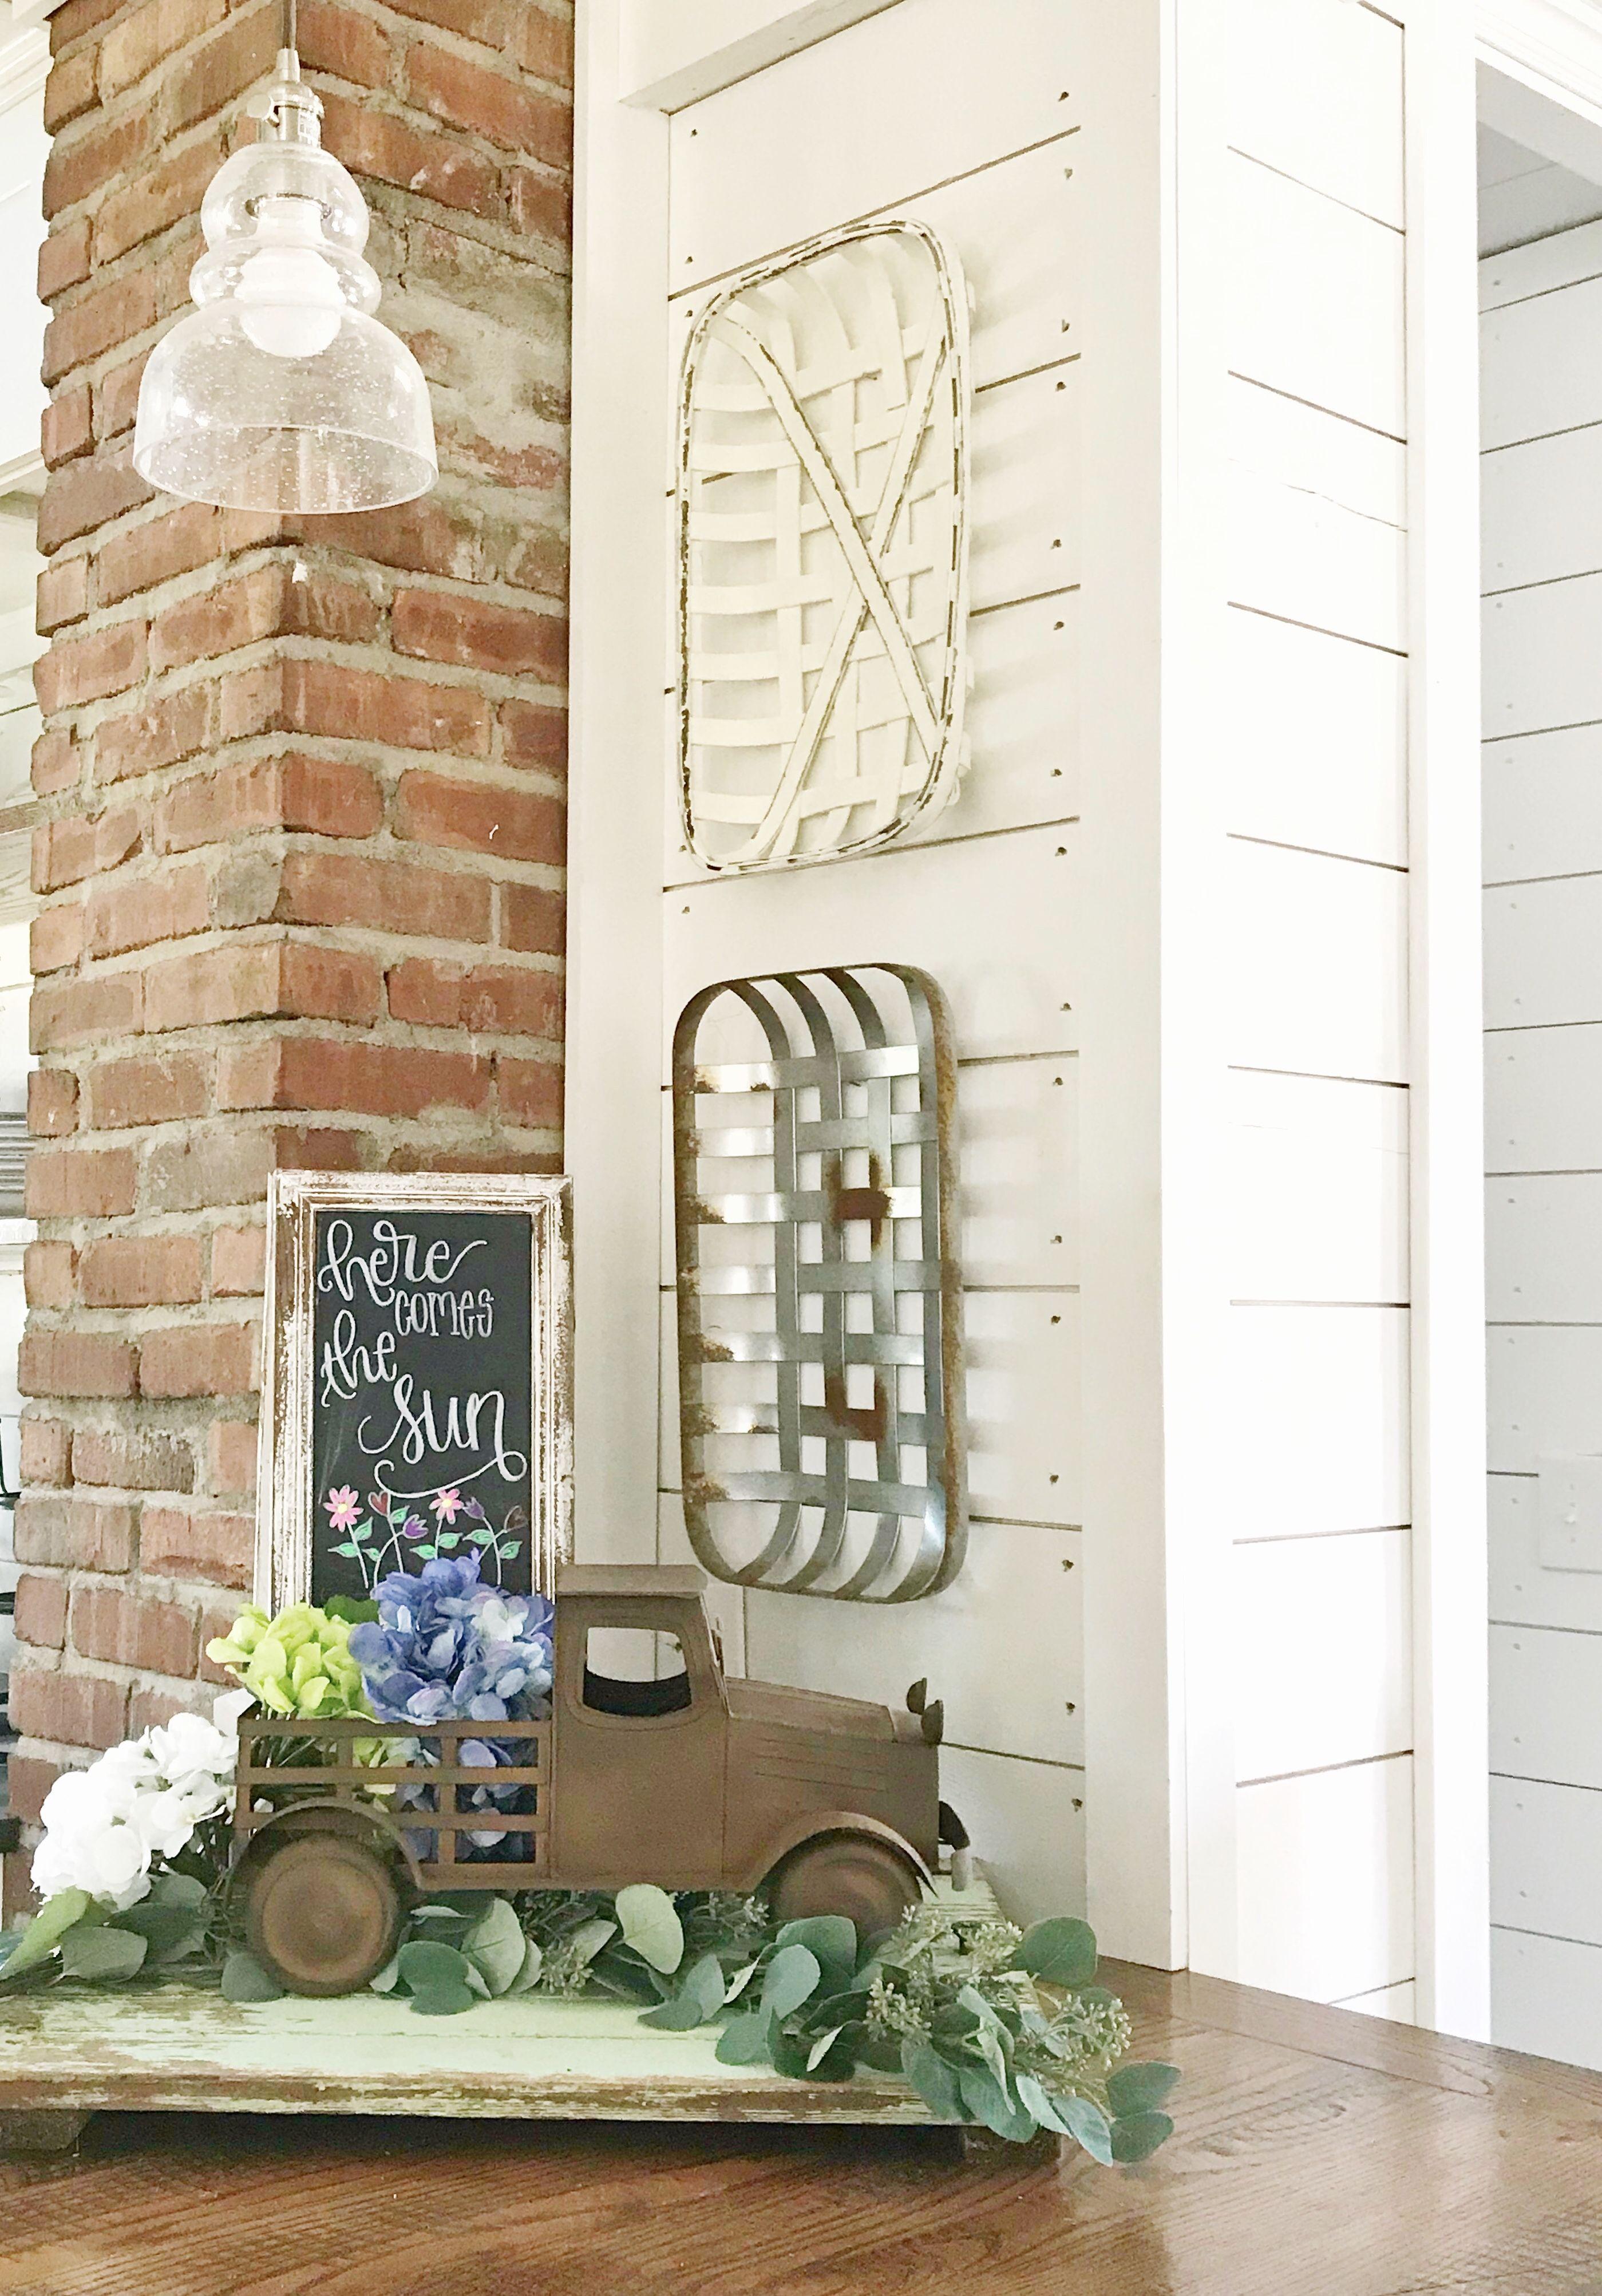 Hobby Lobby Has Given Tobacco Baskets An Entirely New Farmhouse Look Follow Me As I Create This Springti Decor Around Tv Farmhouse Decor Tobacco Basket Decor